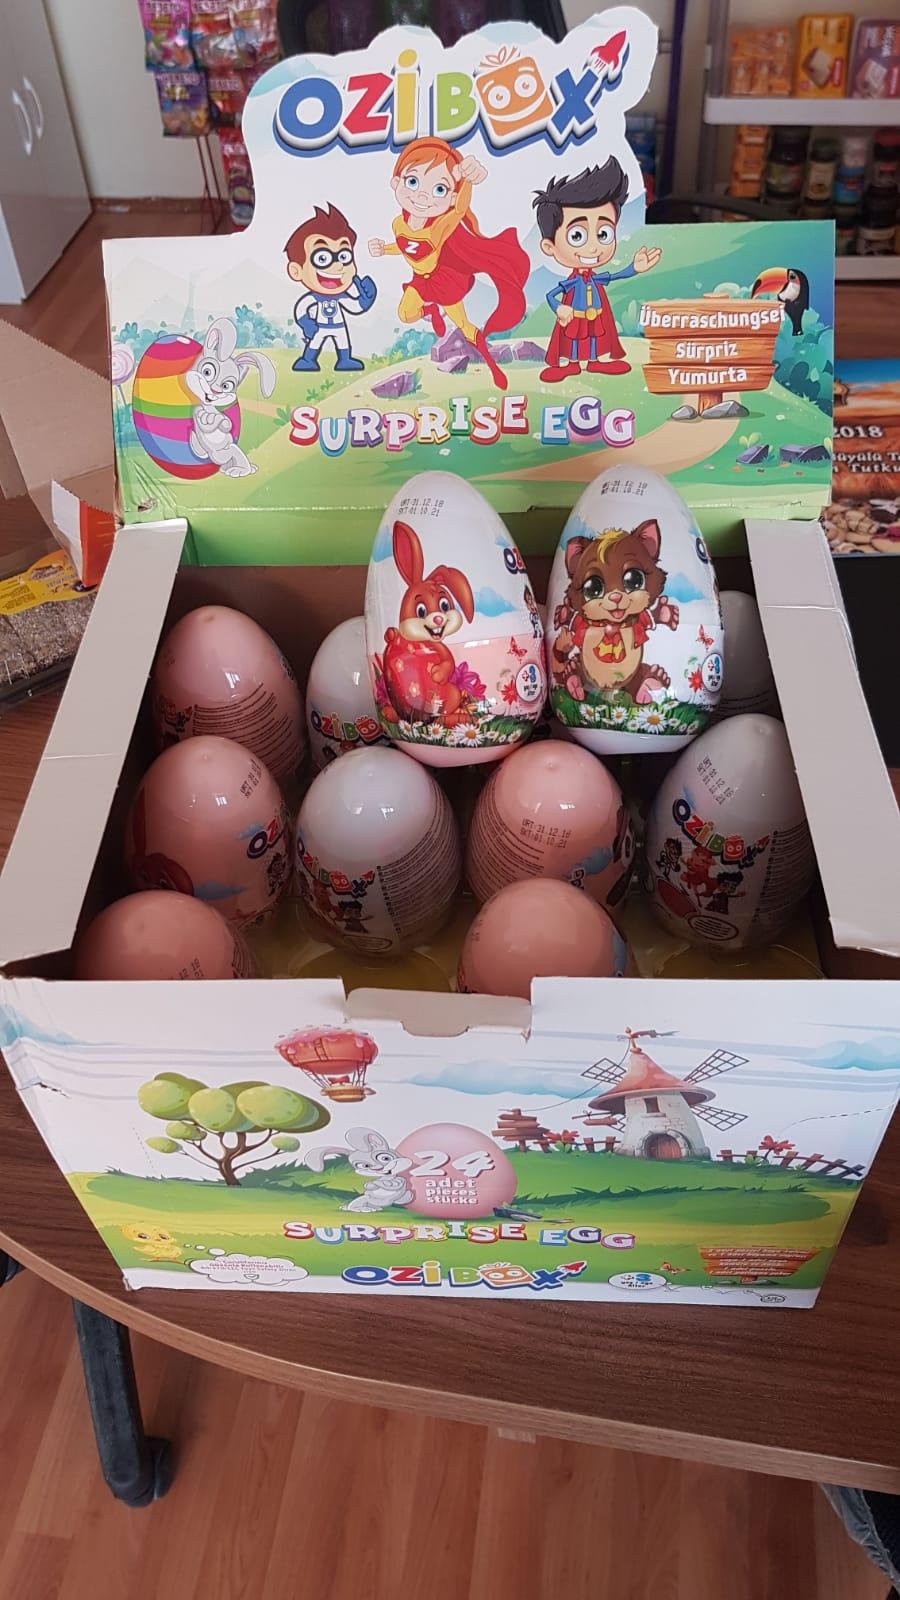 Suprise egg chocolate